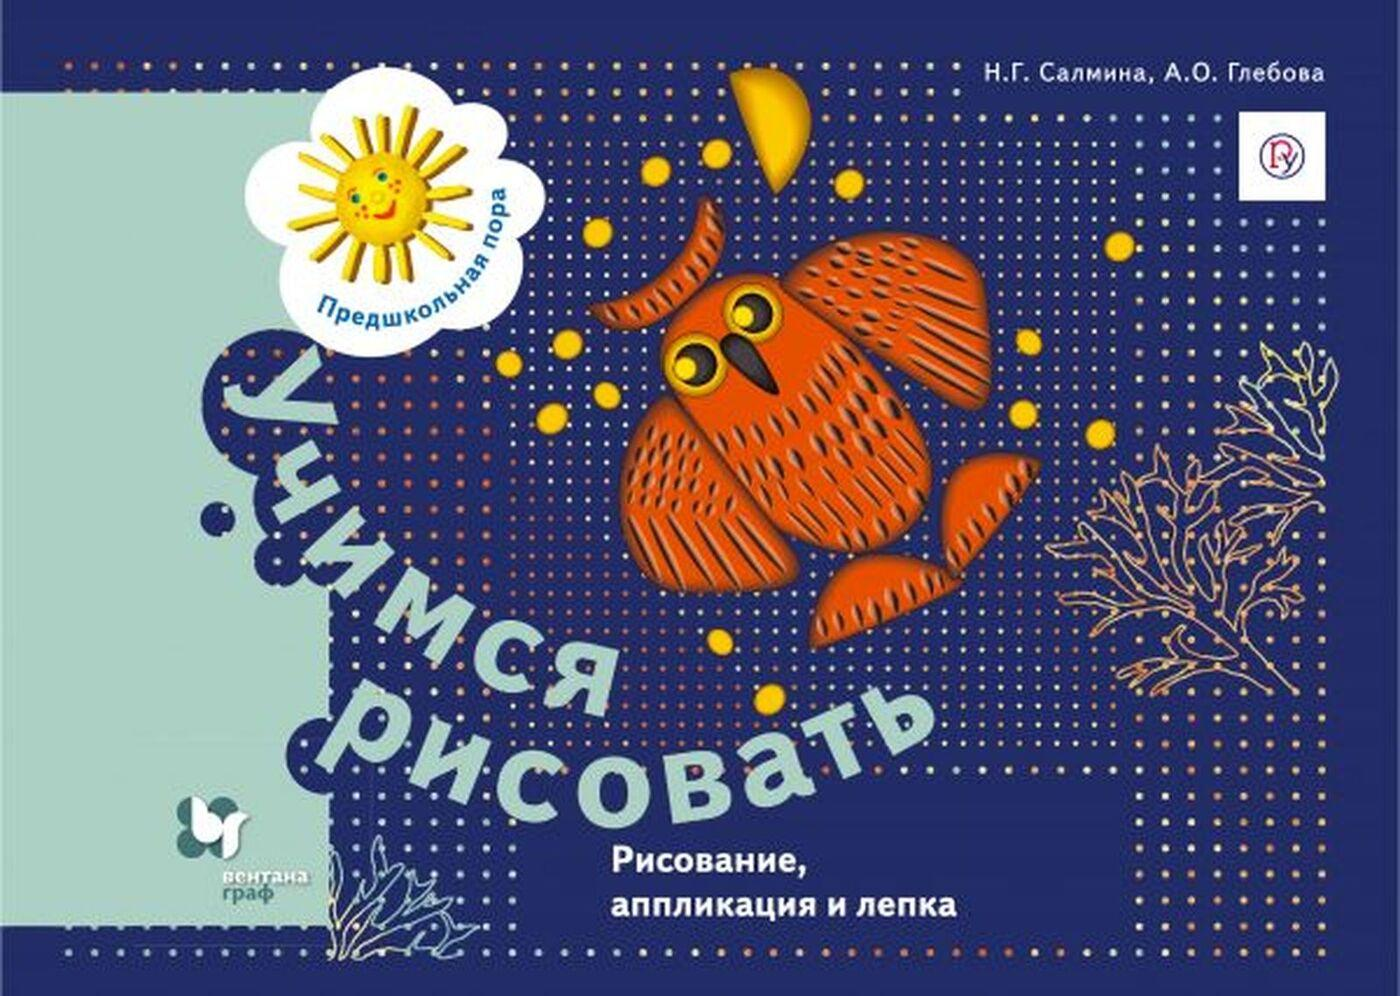 Uchimsja risovat. Risunok, applikatsija i lepka   Salmina Nina Gavrilovna, Glebova Anna Olegovna